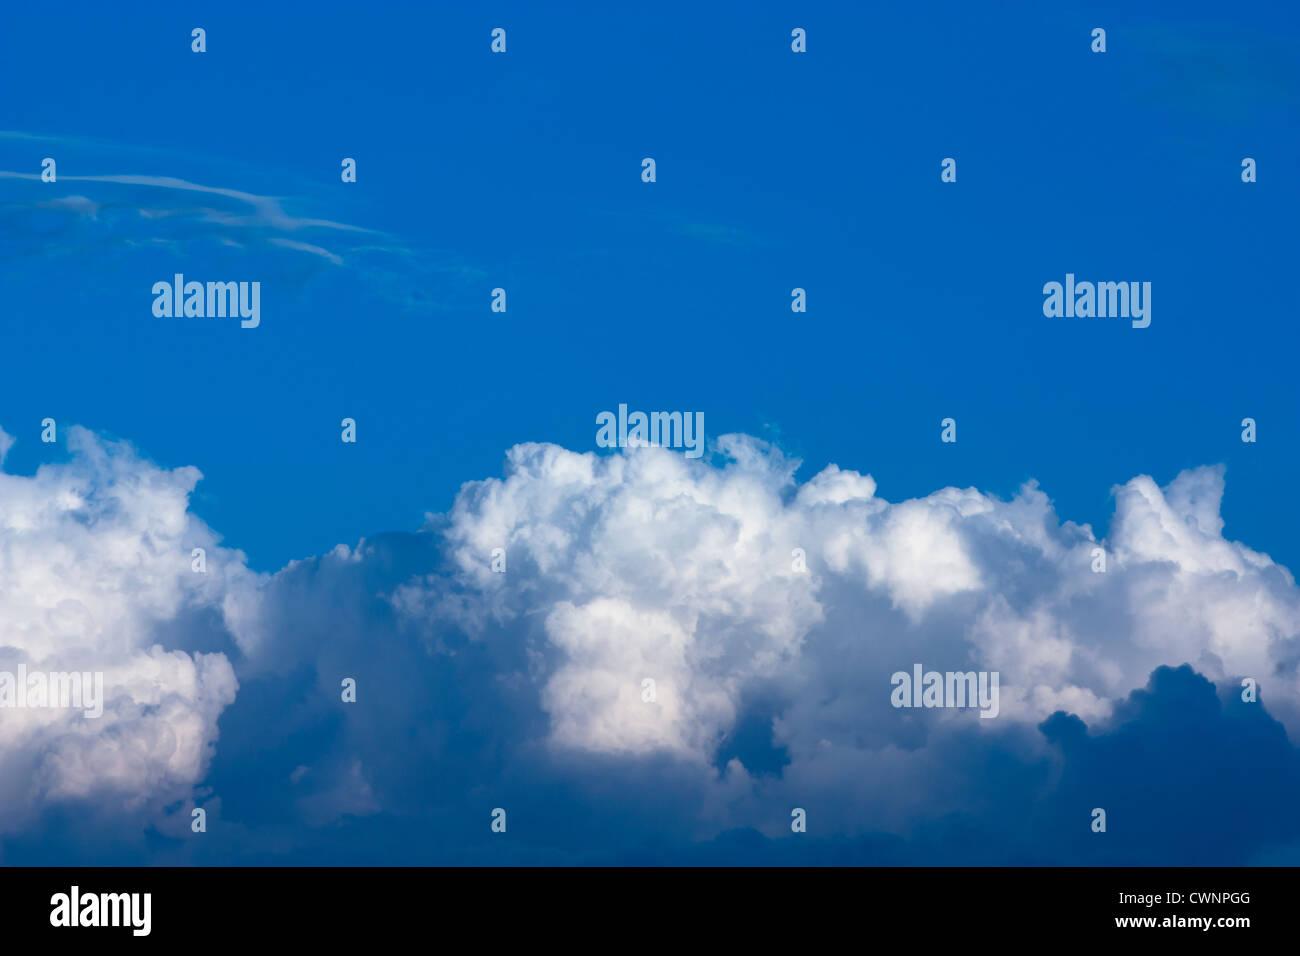 Wolkenbank, Blauer Himmel, Wolken, Wolken, Wolkenbank, blauer Himmel Stockbild